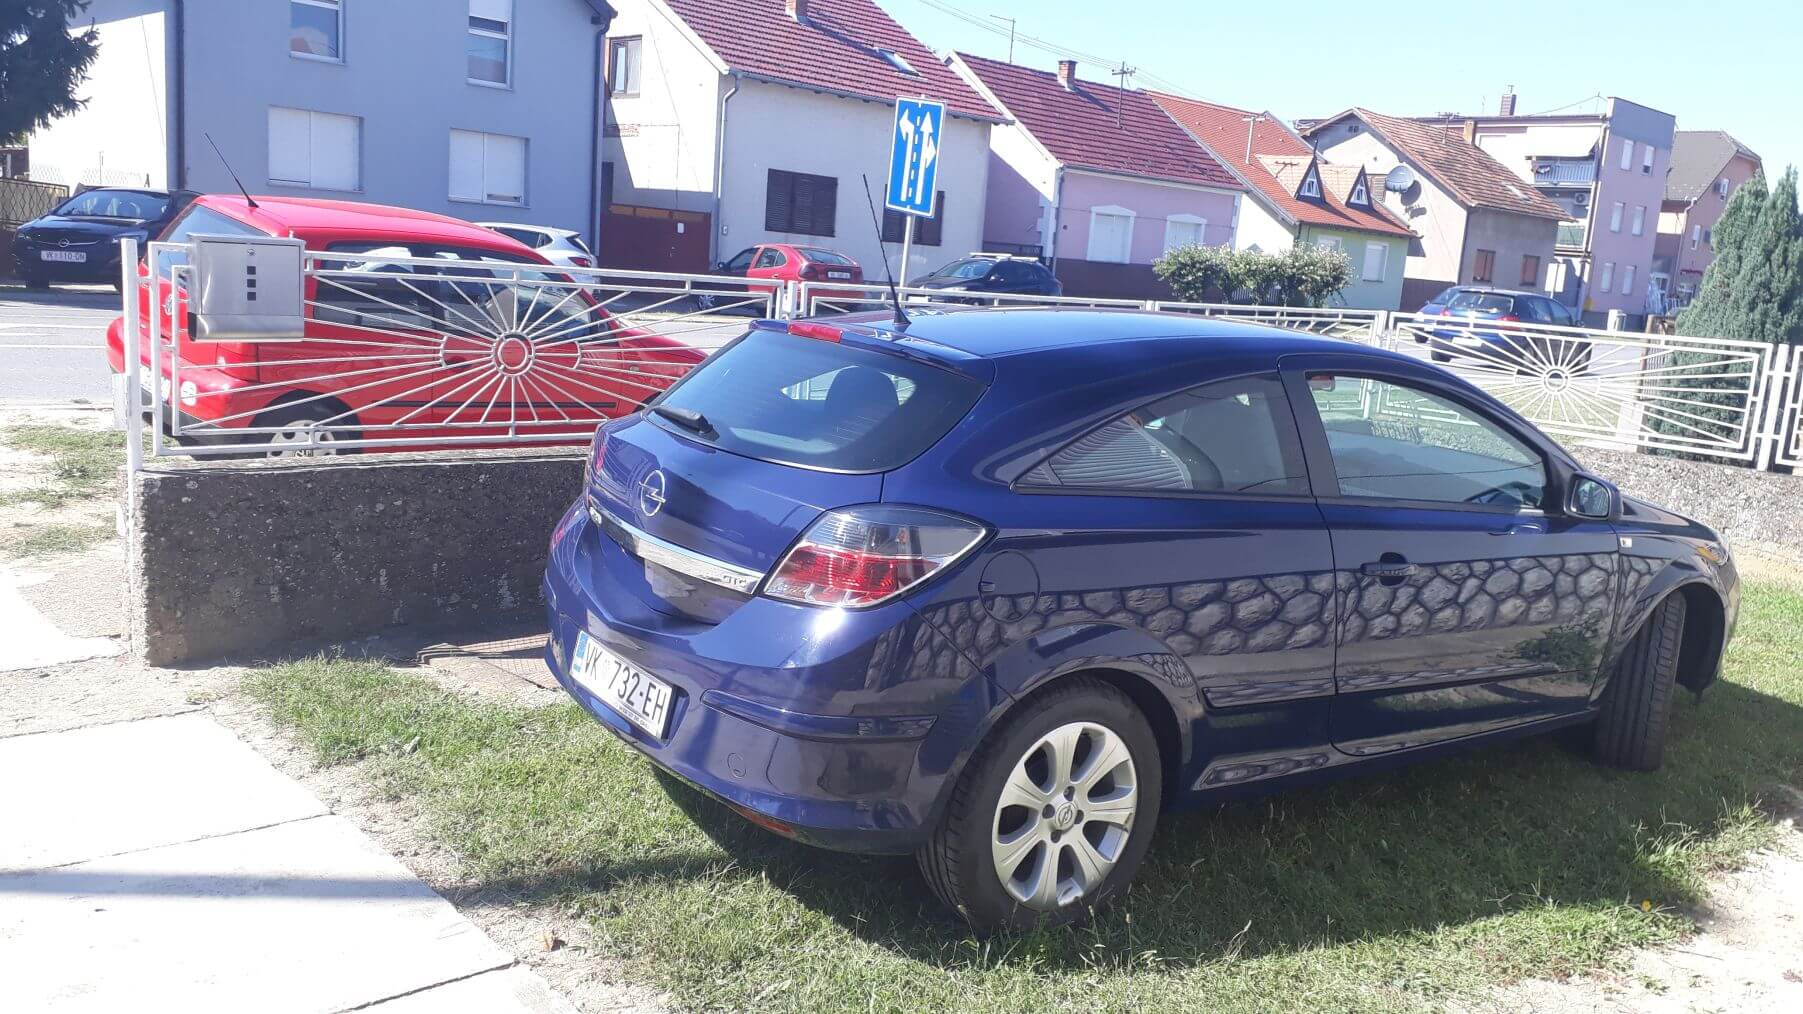 Opel Astra H GTC 2008 1.4